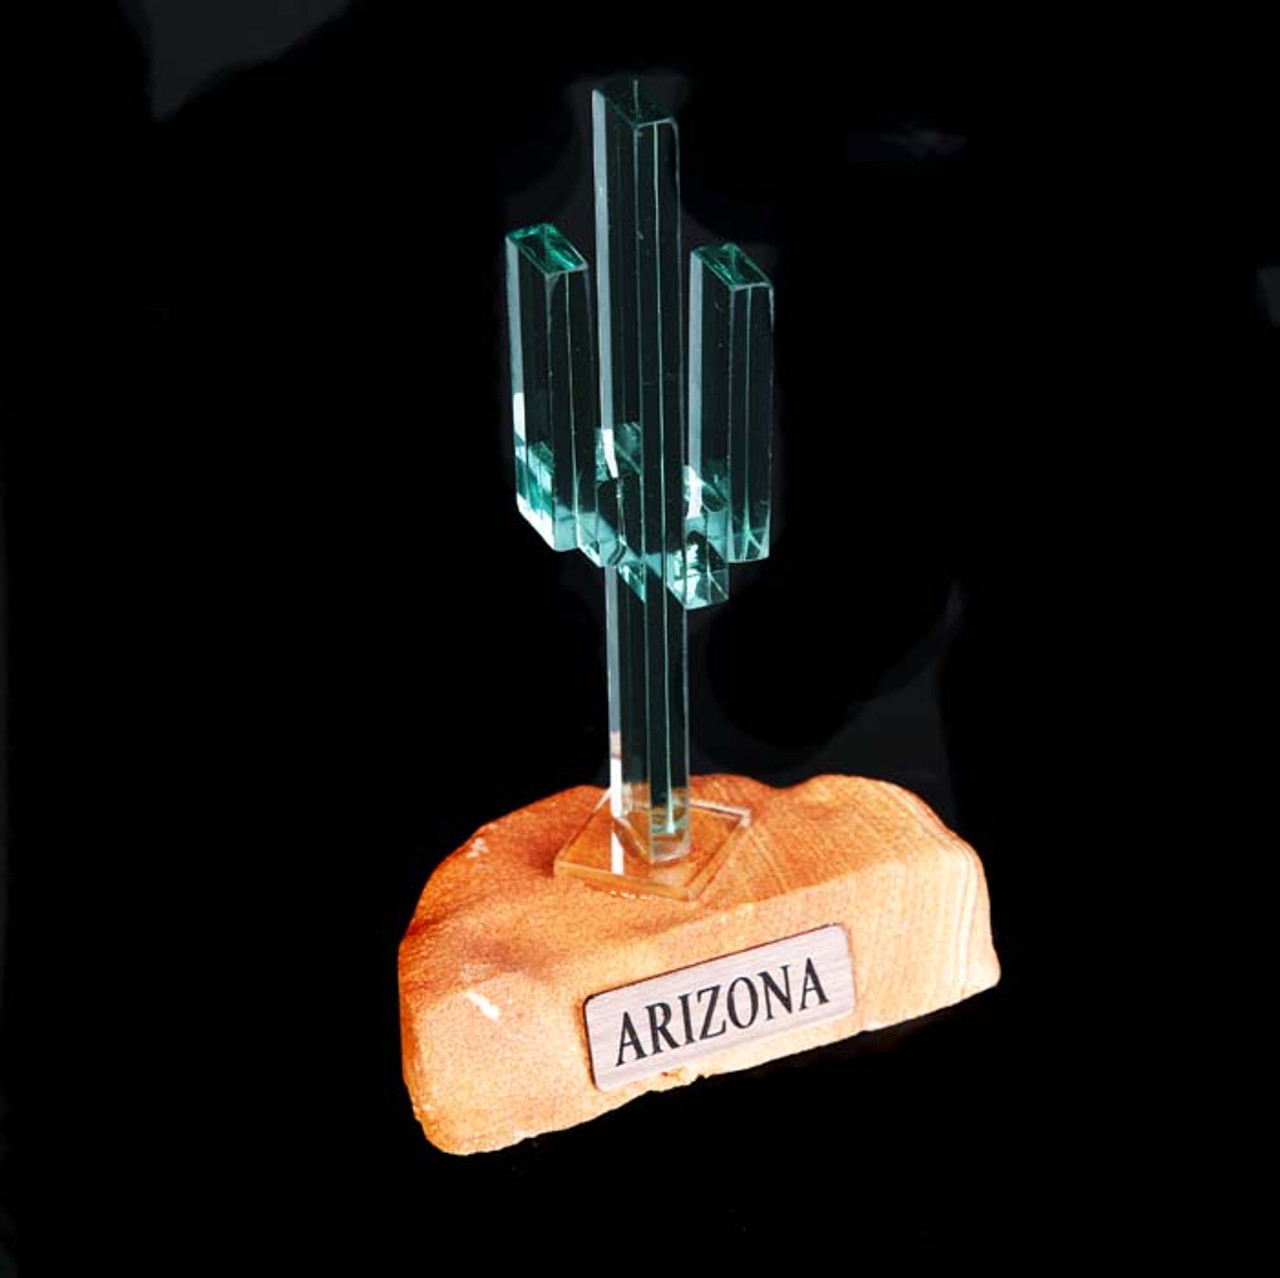 "Vertical Glass Cactus 4"" w/Sandstone"